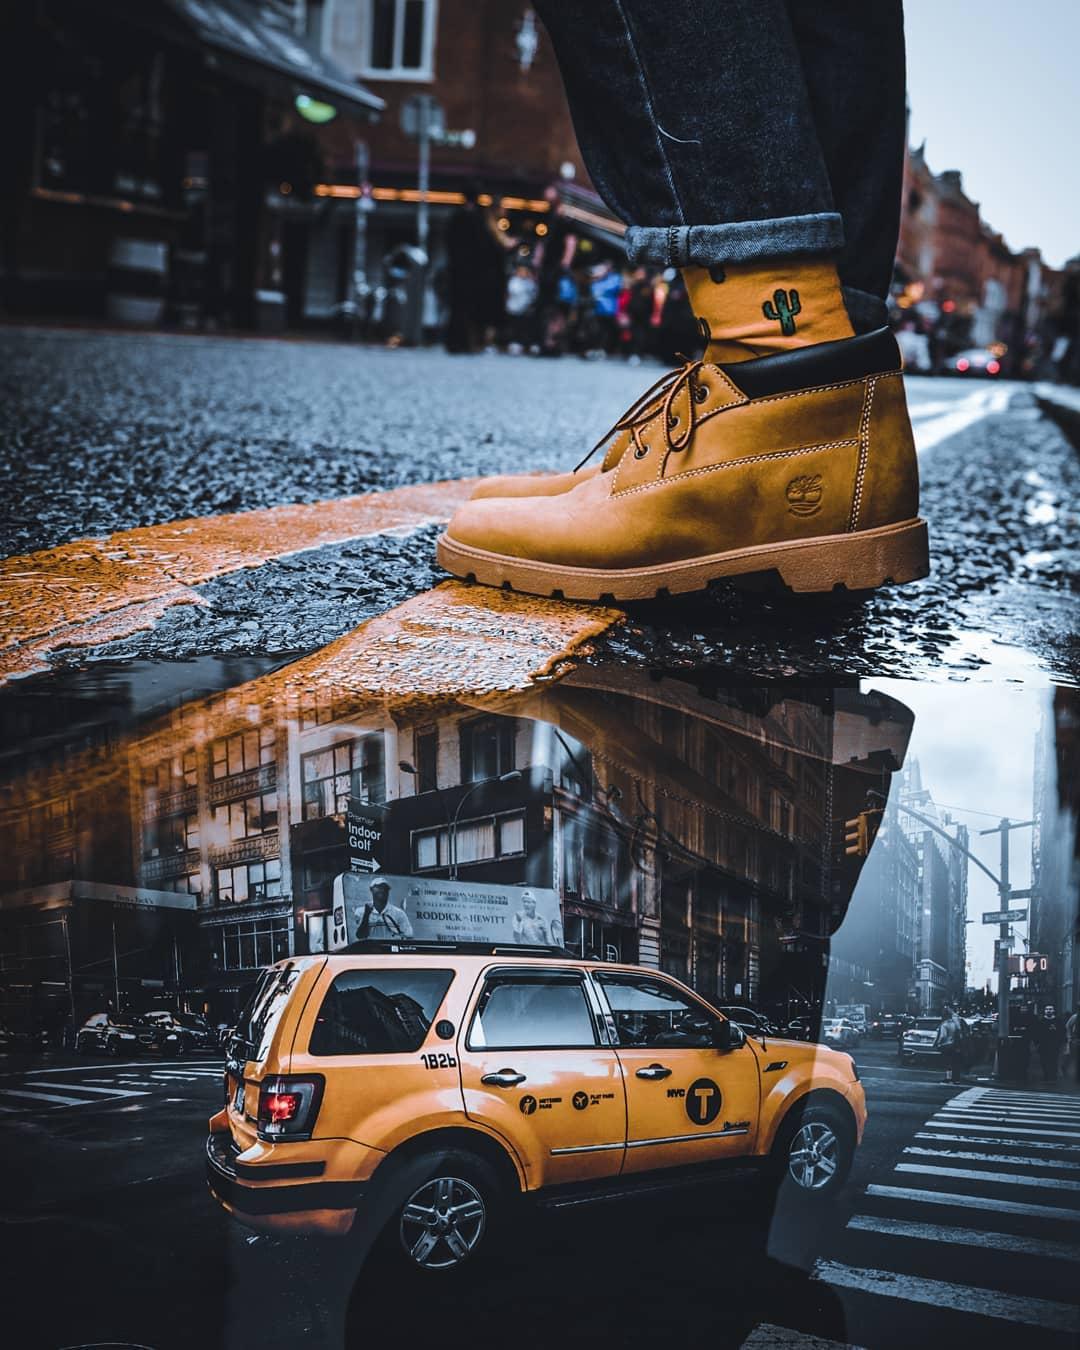 Beautiful and Creative Editing Photos by Egzon Muliqi